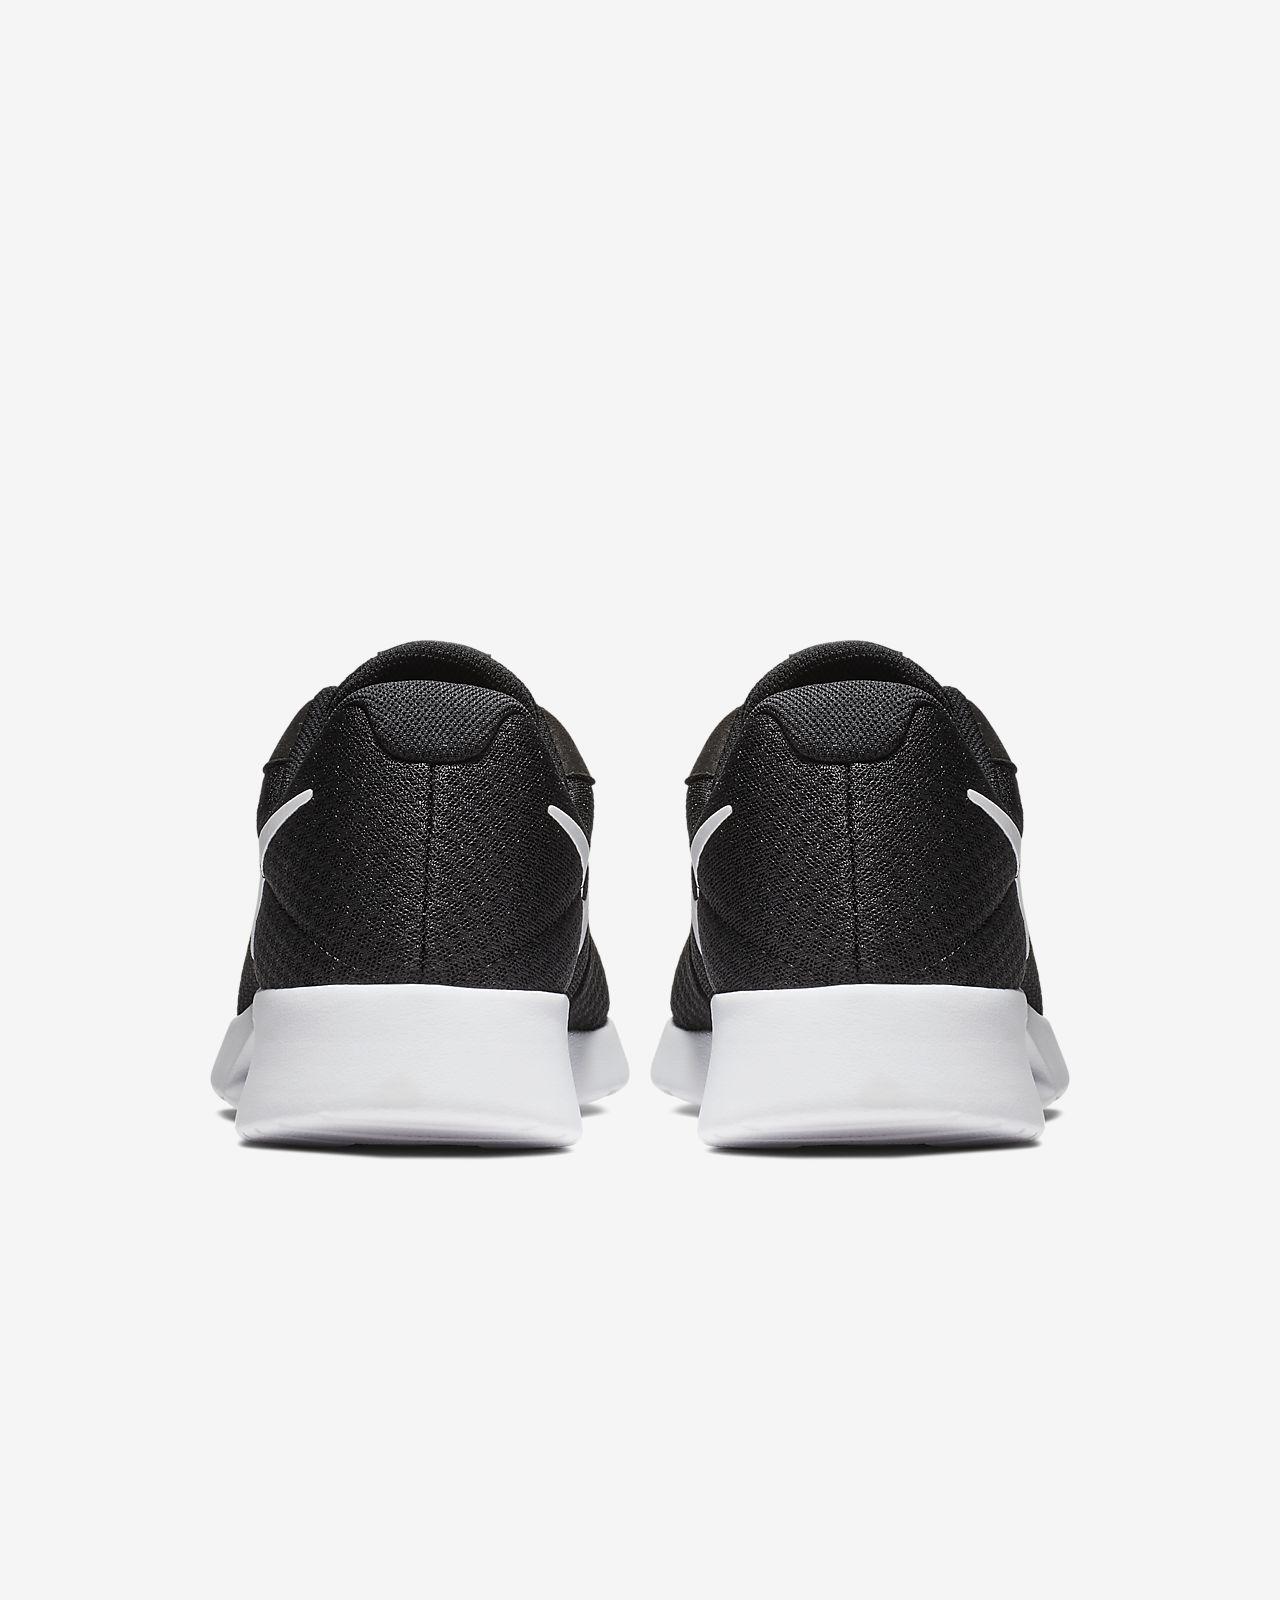 low priced 514cf 3be60 Low Resolution Nike Tanjun Men s Shoe Nike Tanjun Men s Shoe